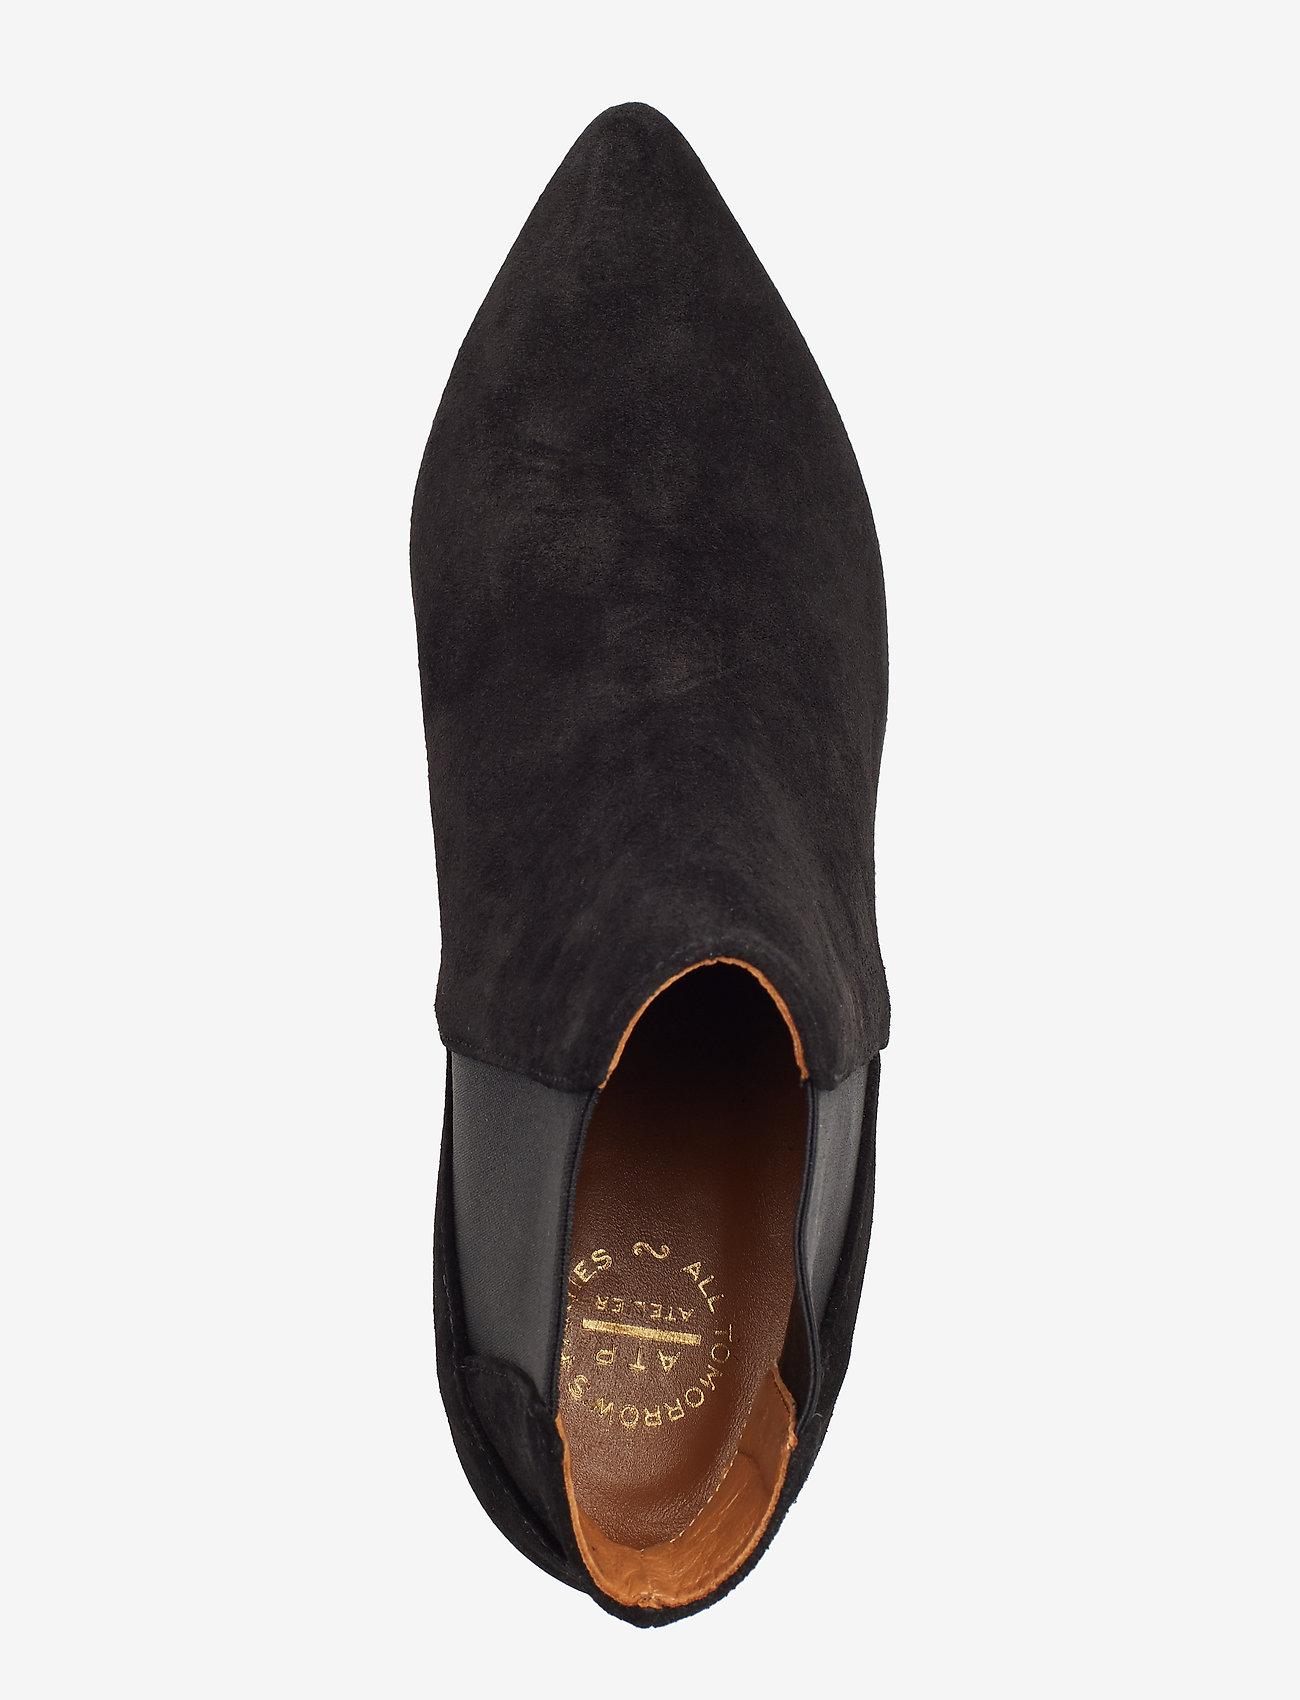 ATP Atelier - Cynara Suede - heeled ankle boots - black - 3